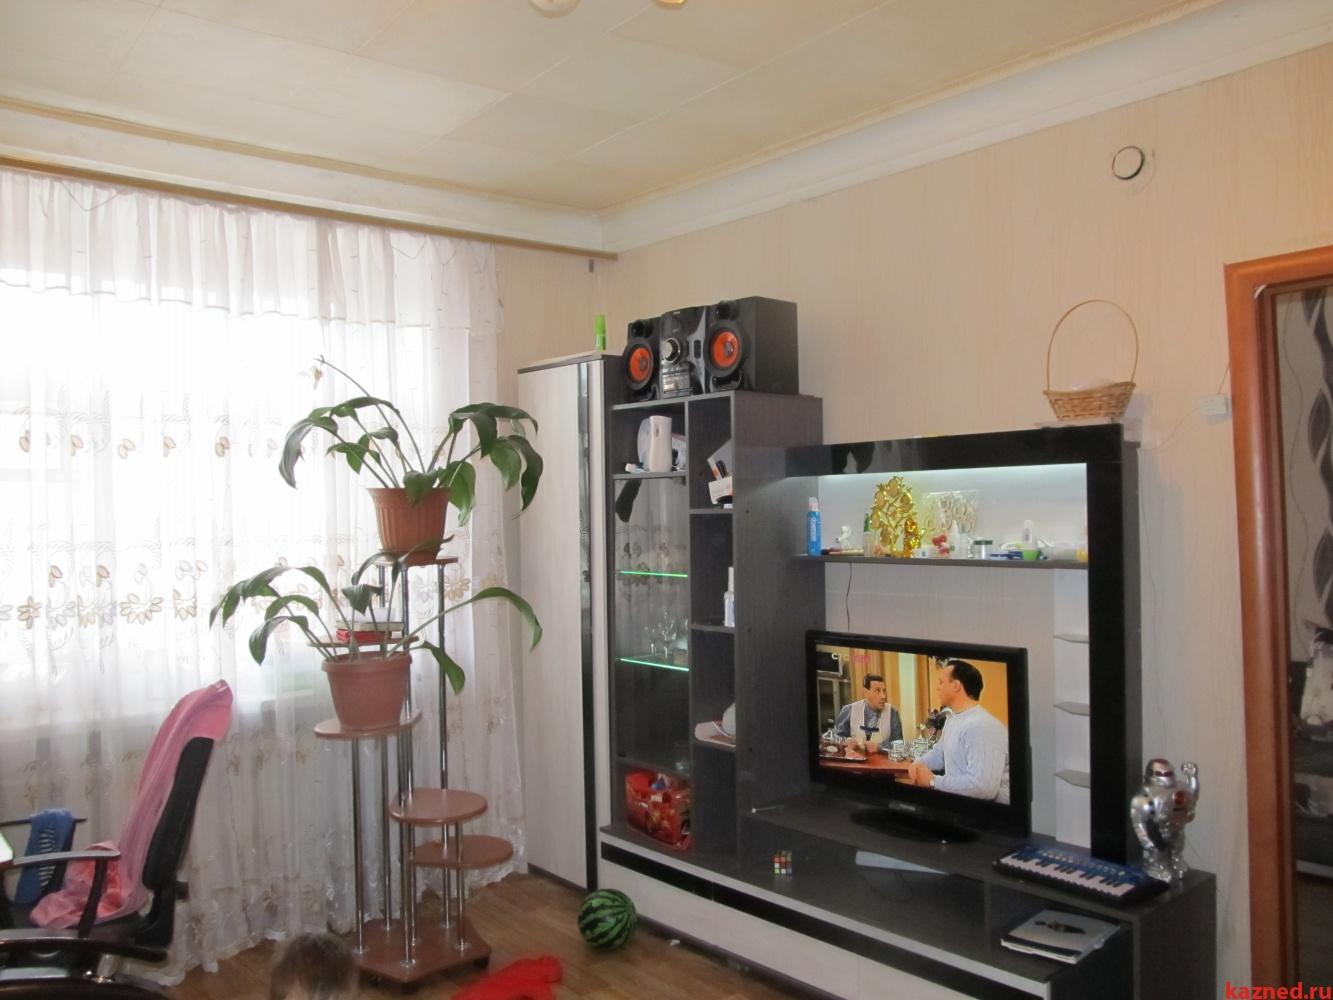 Продажа 2-к квартиры Тунакова, 41А, 39 м²  (миниатюра №1)